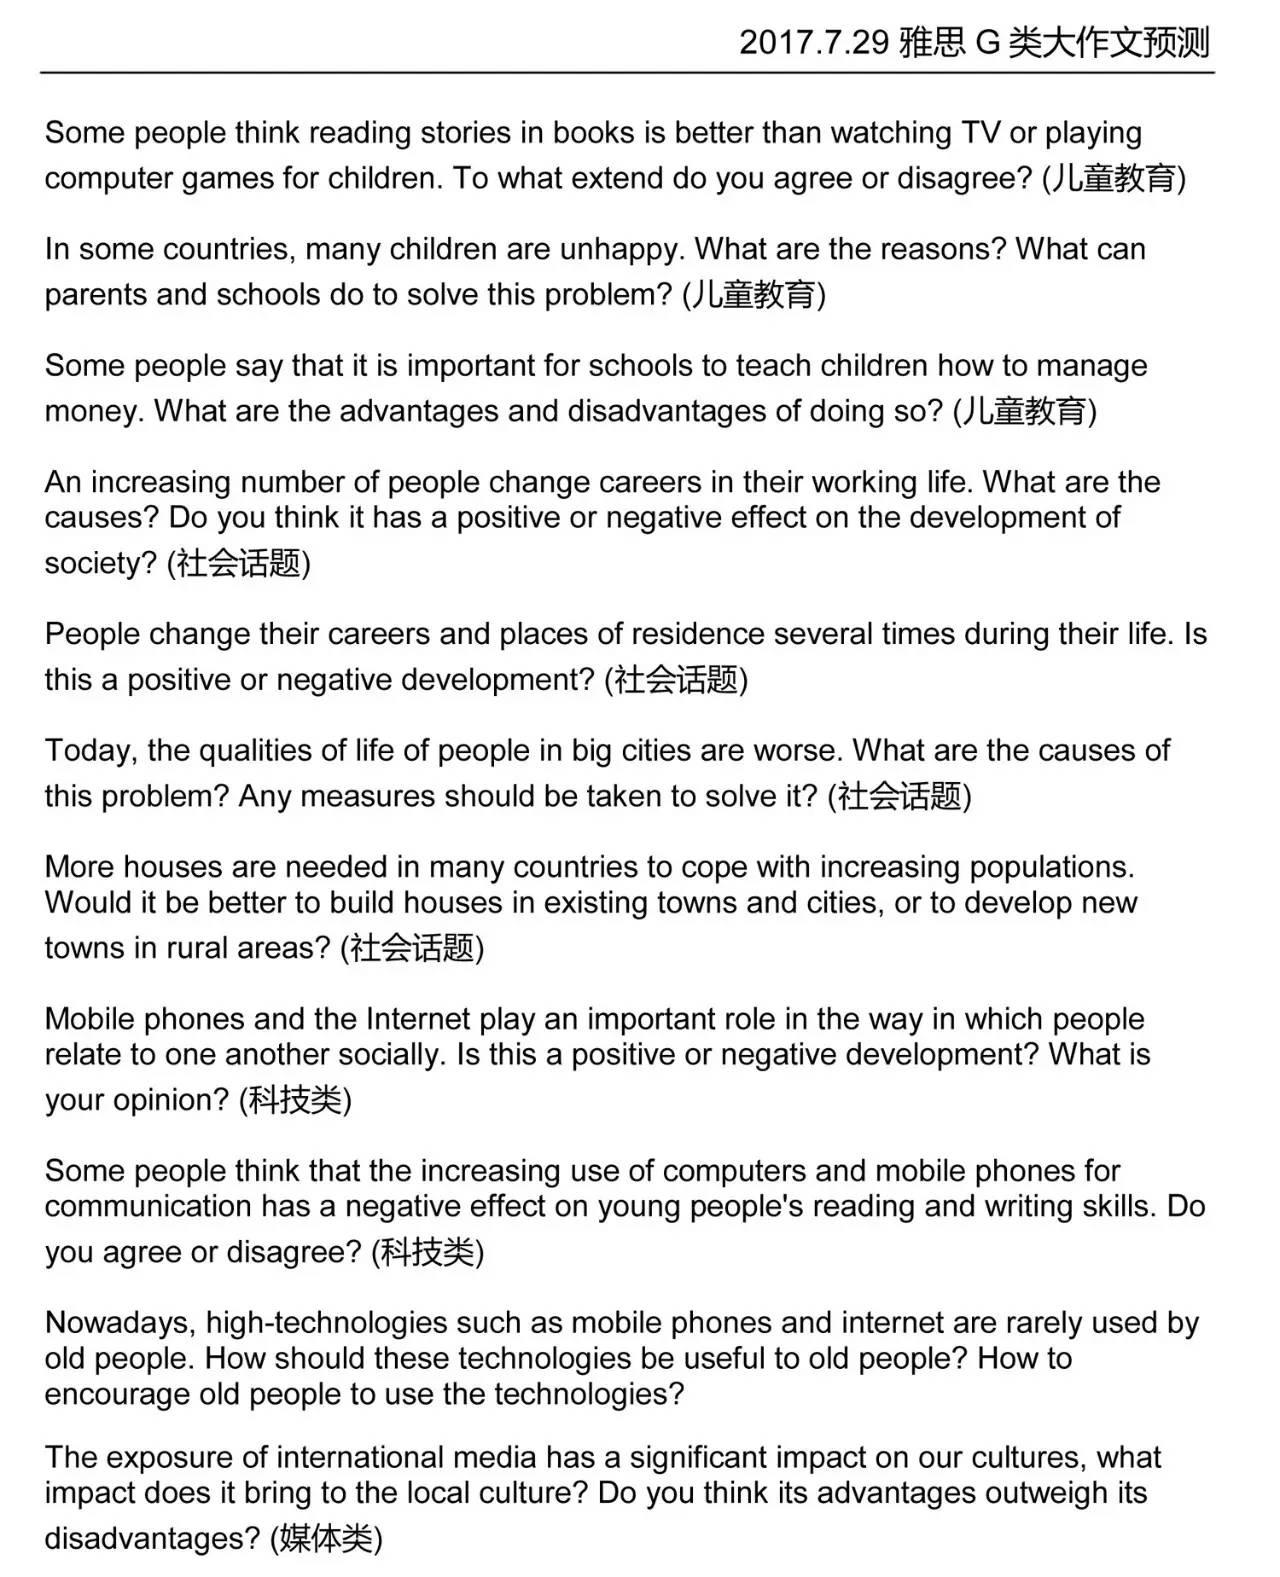 wechat-image_20170728103737